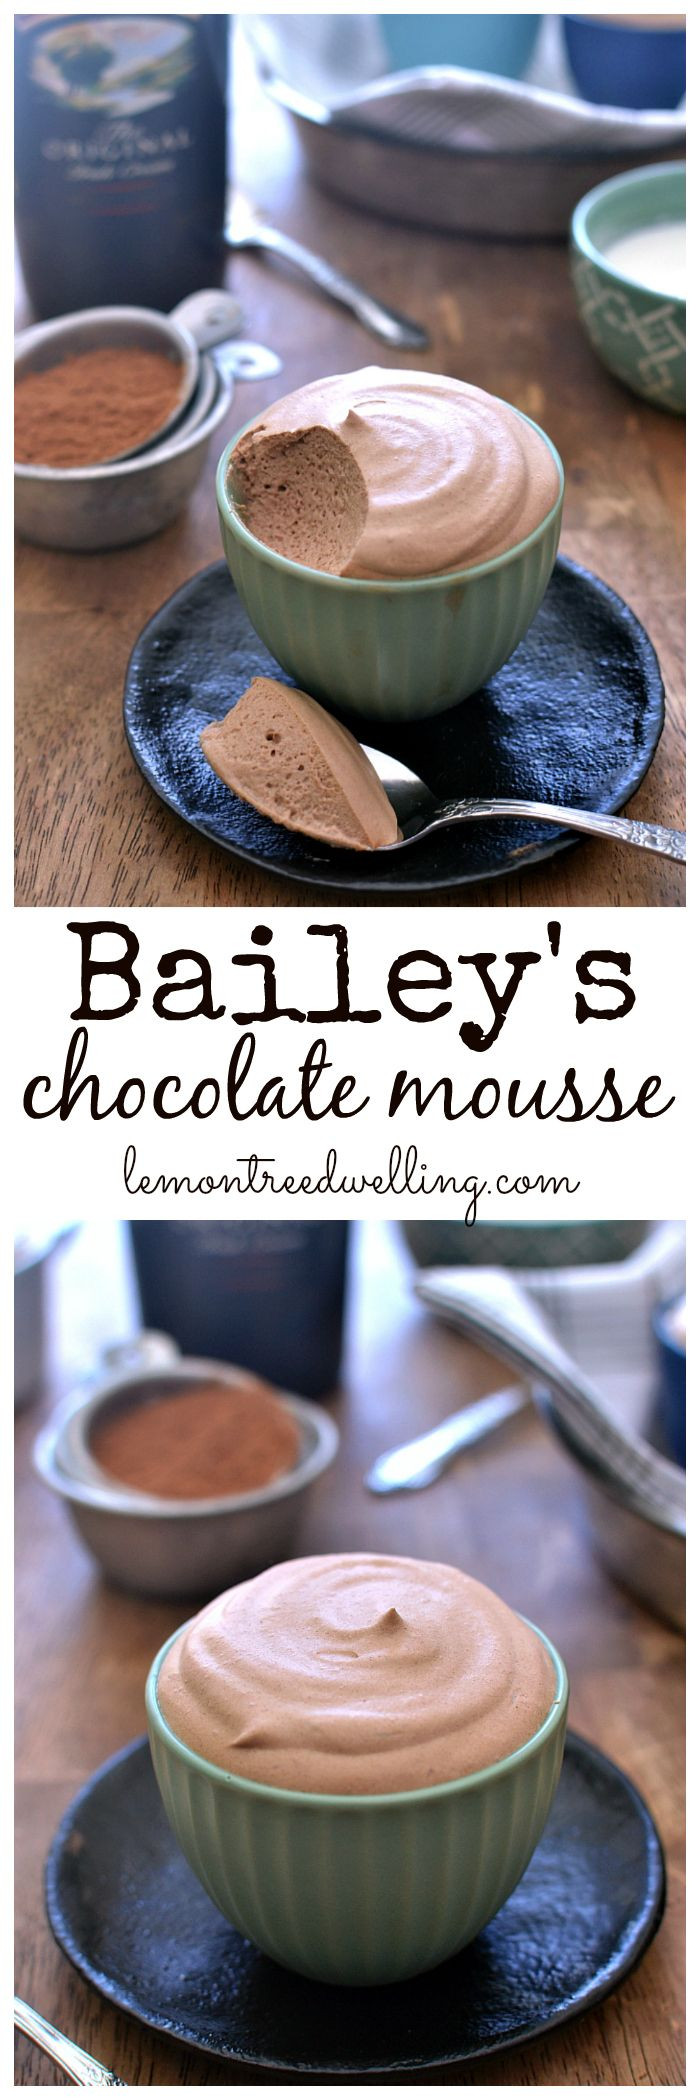 Christmas Desserts 2019  Bailey's Chocolate Mousse Lemon Tree Dwelling